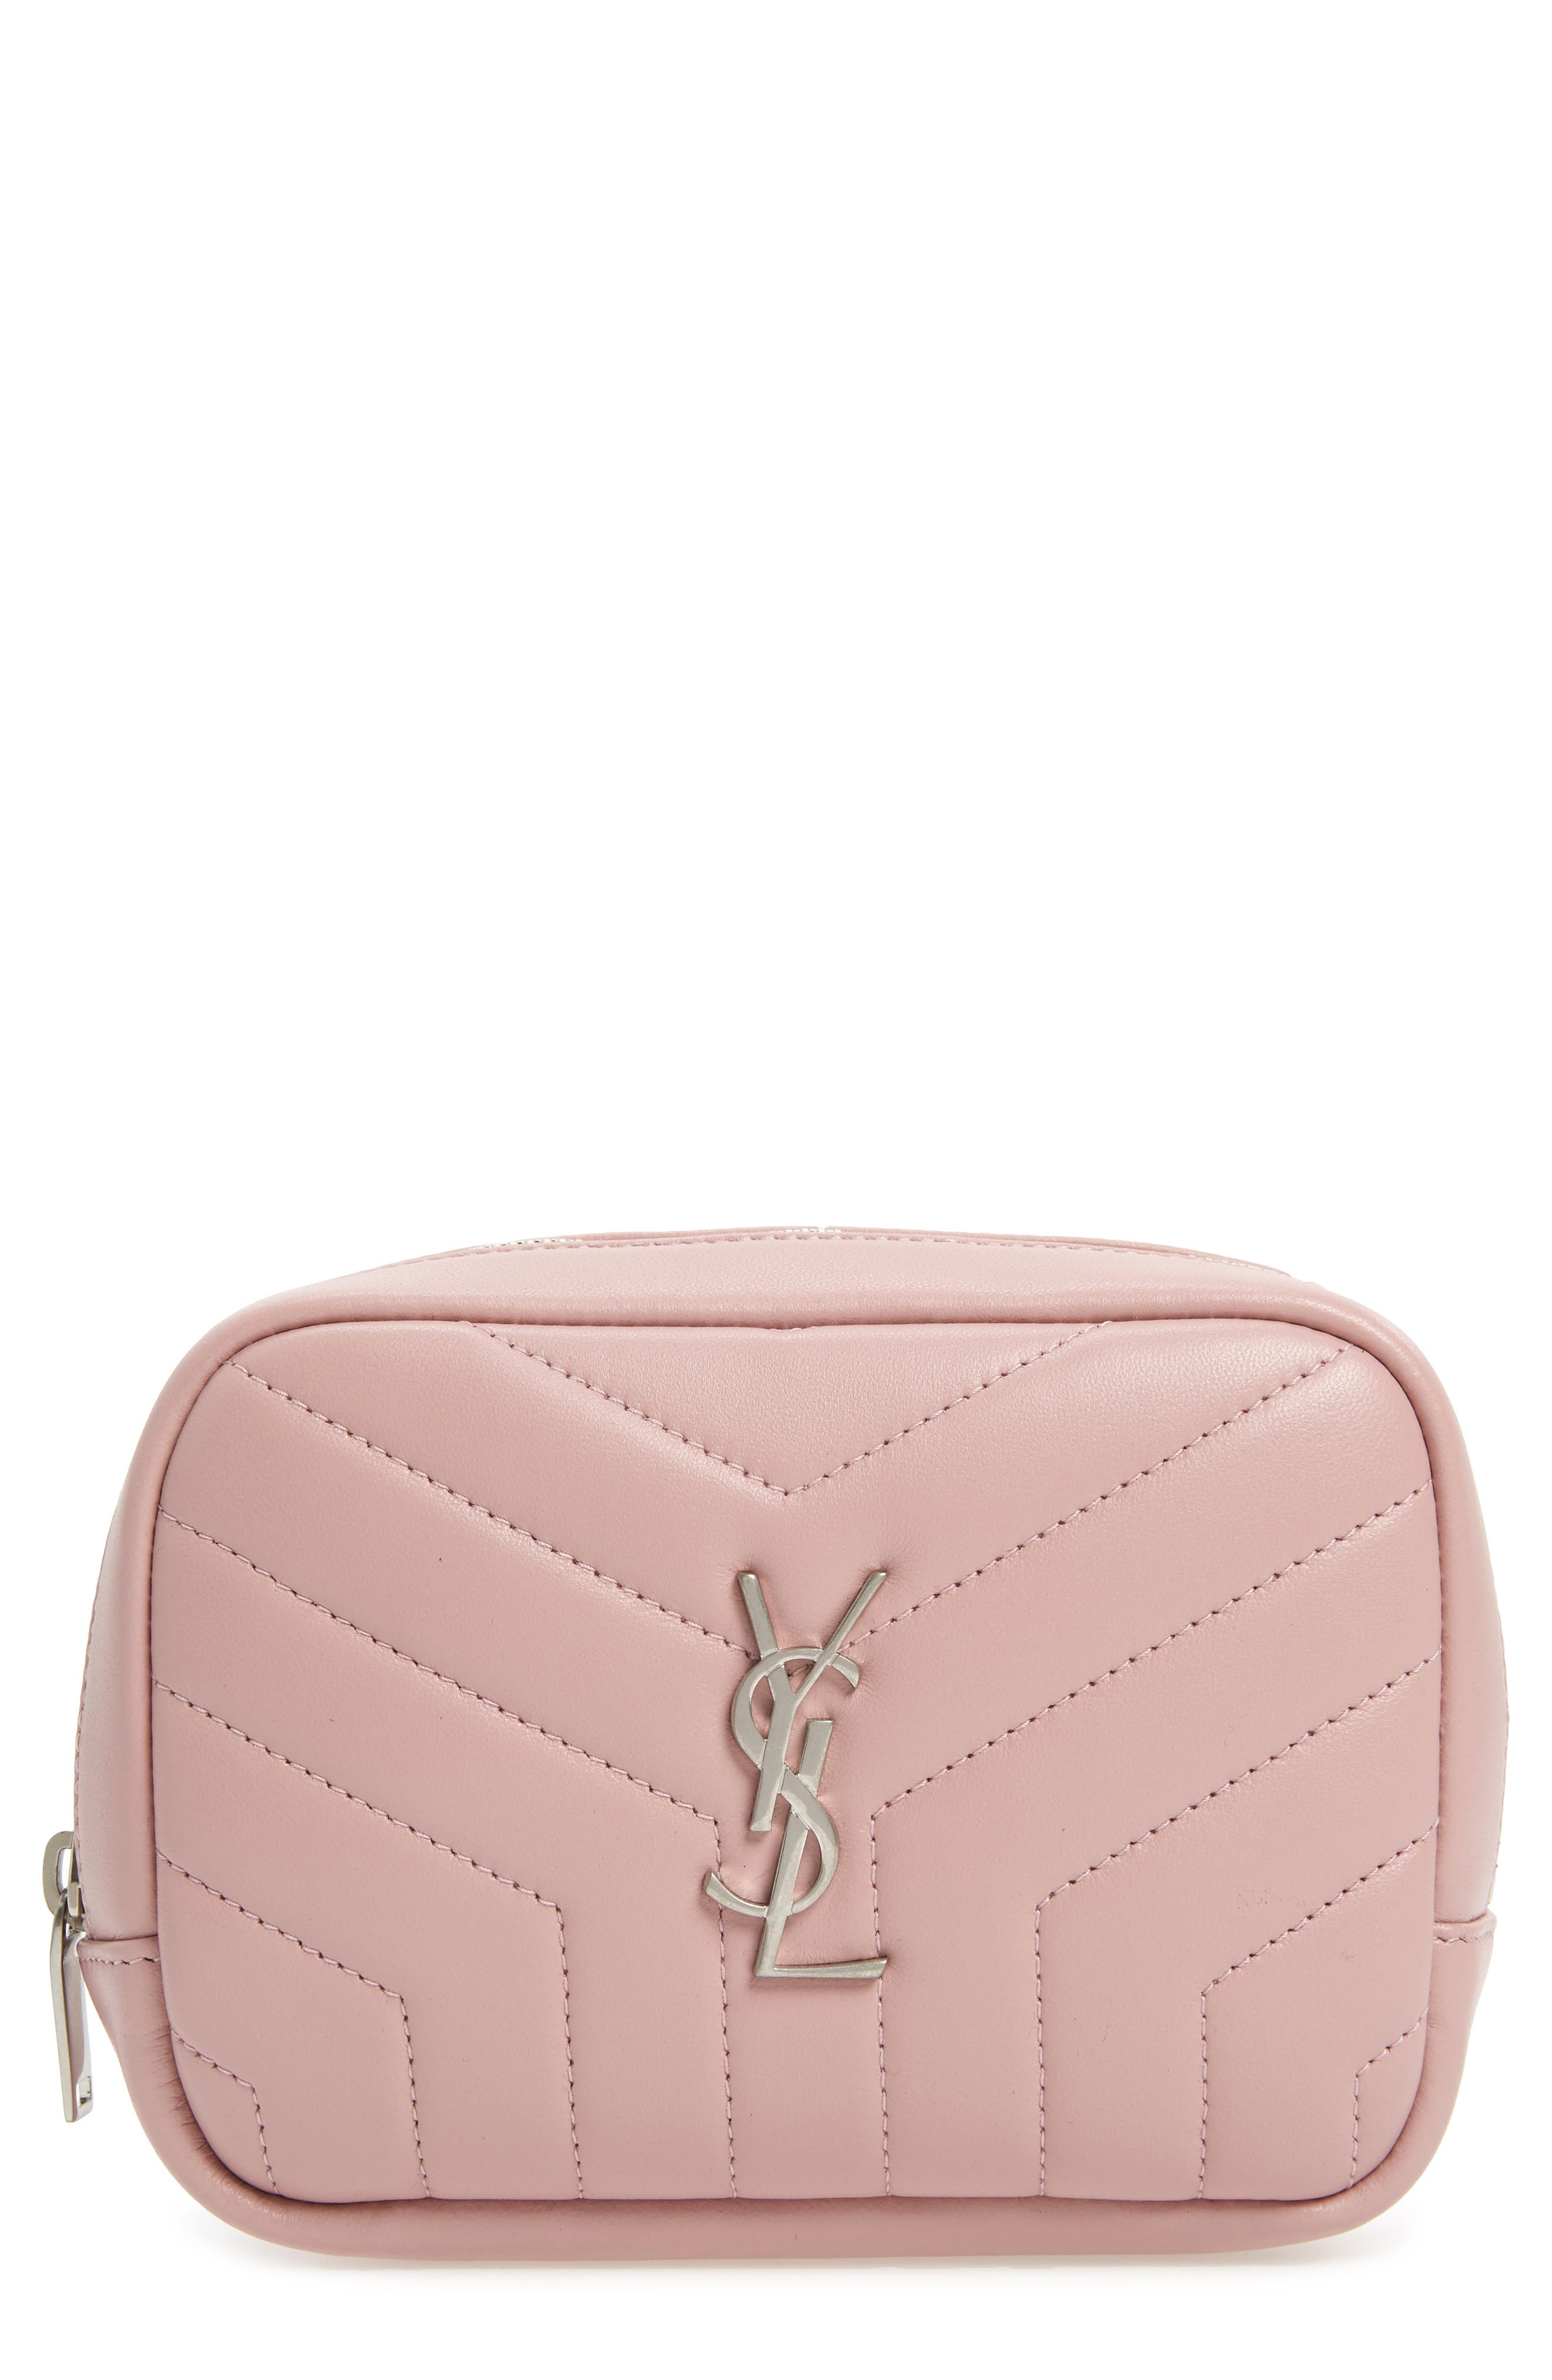 Loulou Matelassé Leather Cosmetics Bag,                         Main,                         color, Tender Pink